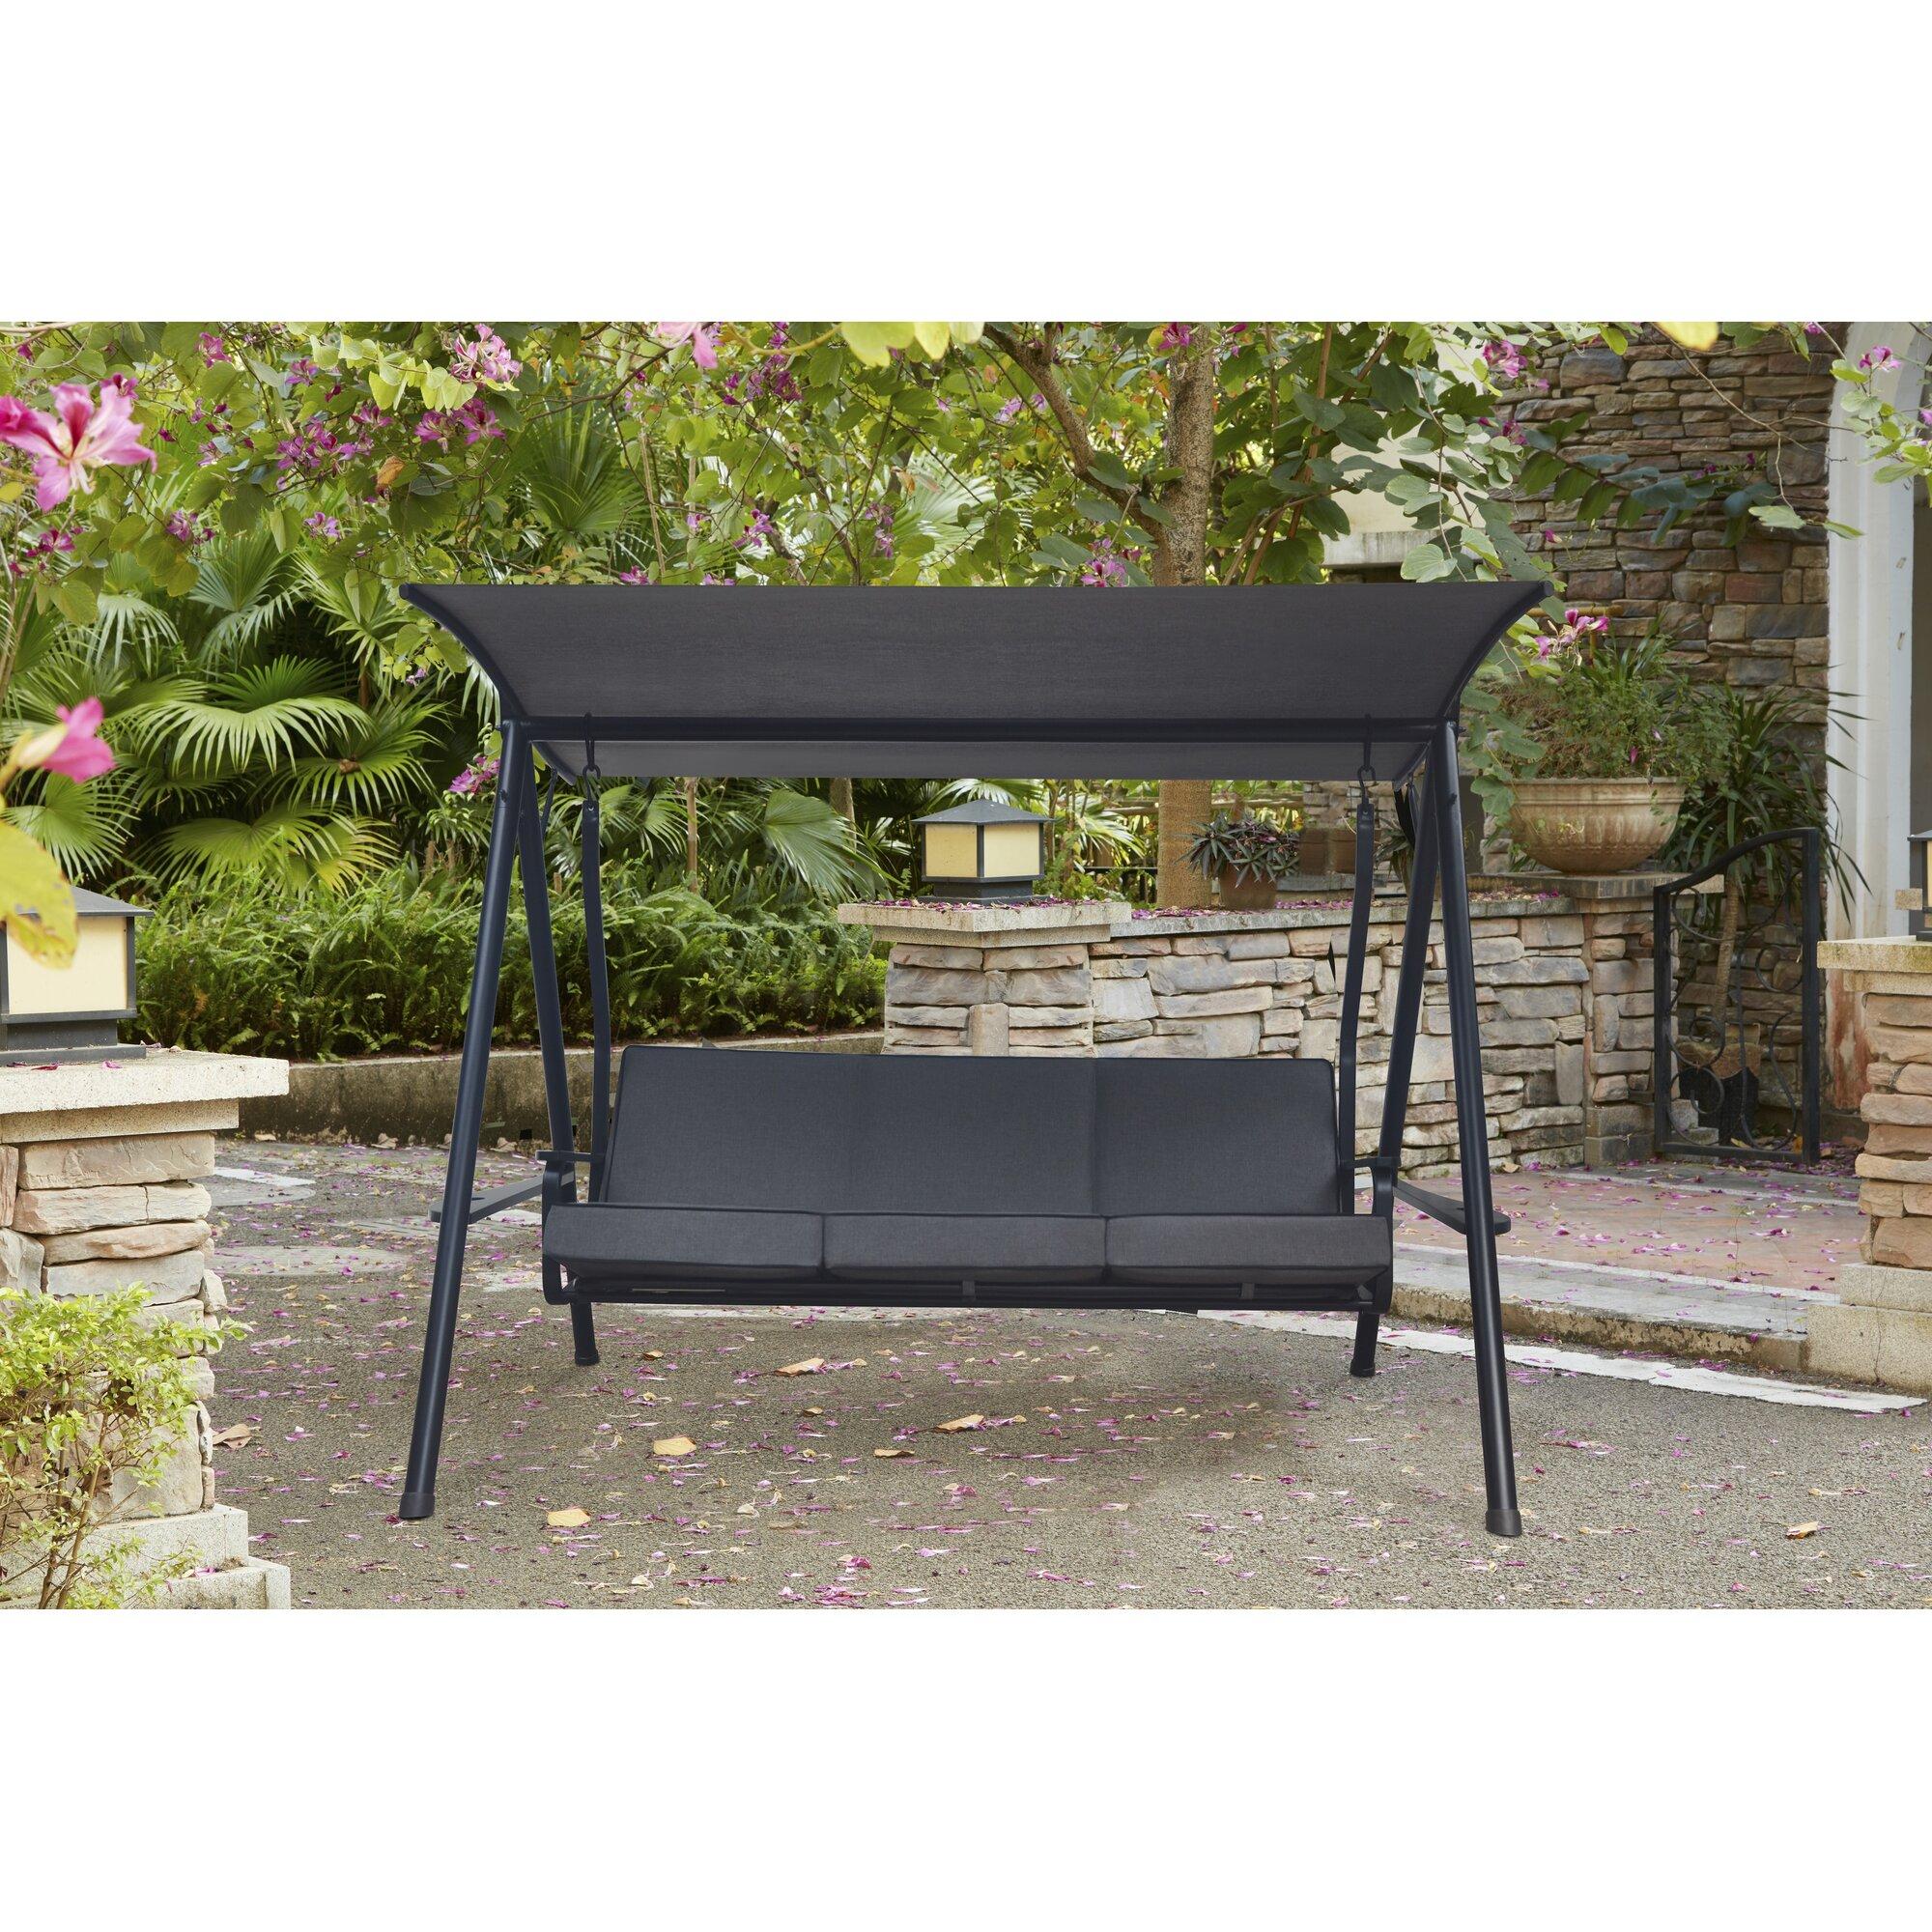 Red Barrel Studio Marine 3 Seat Cushion Porch Swing with